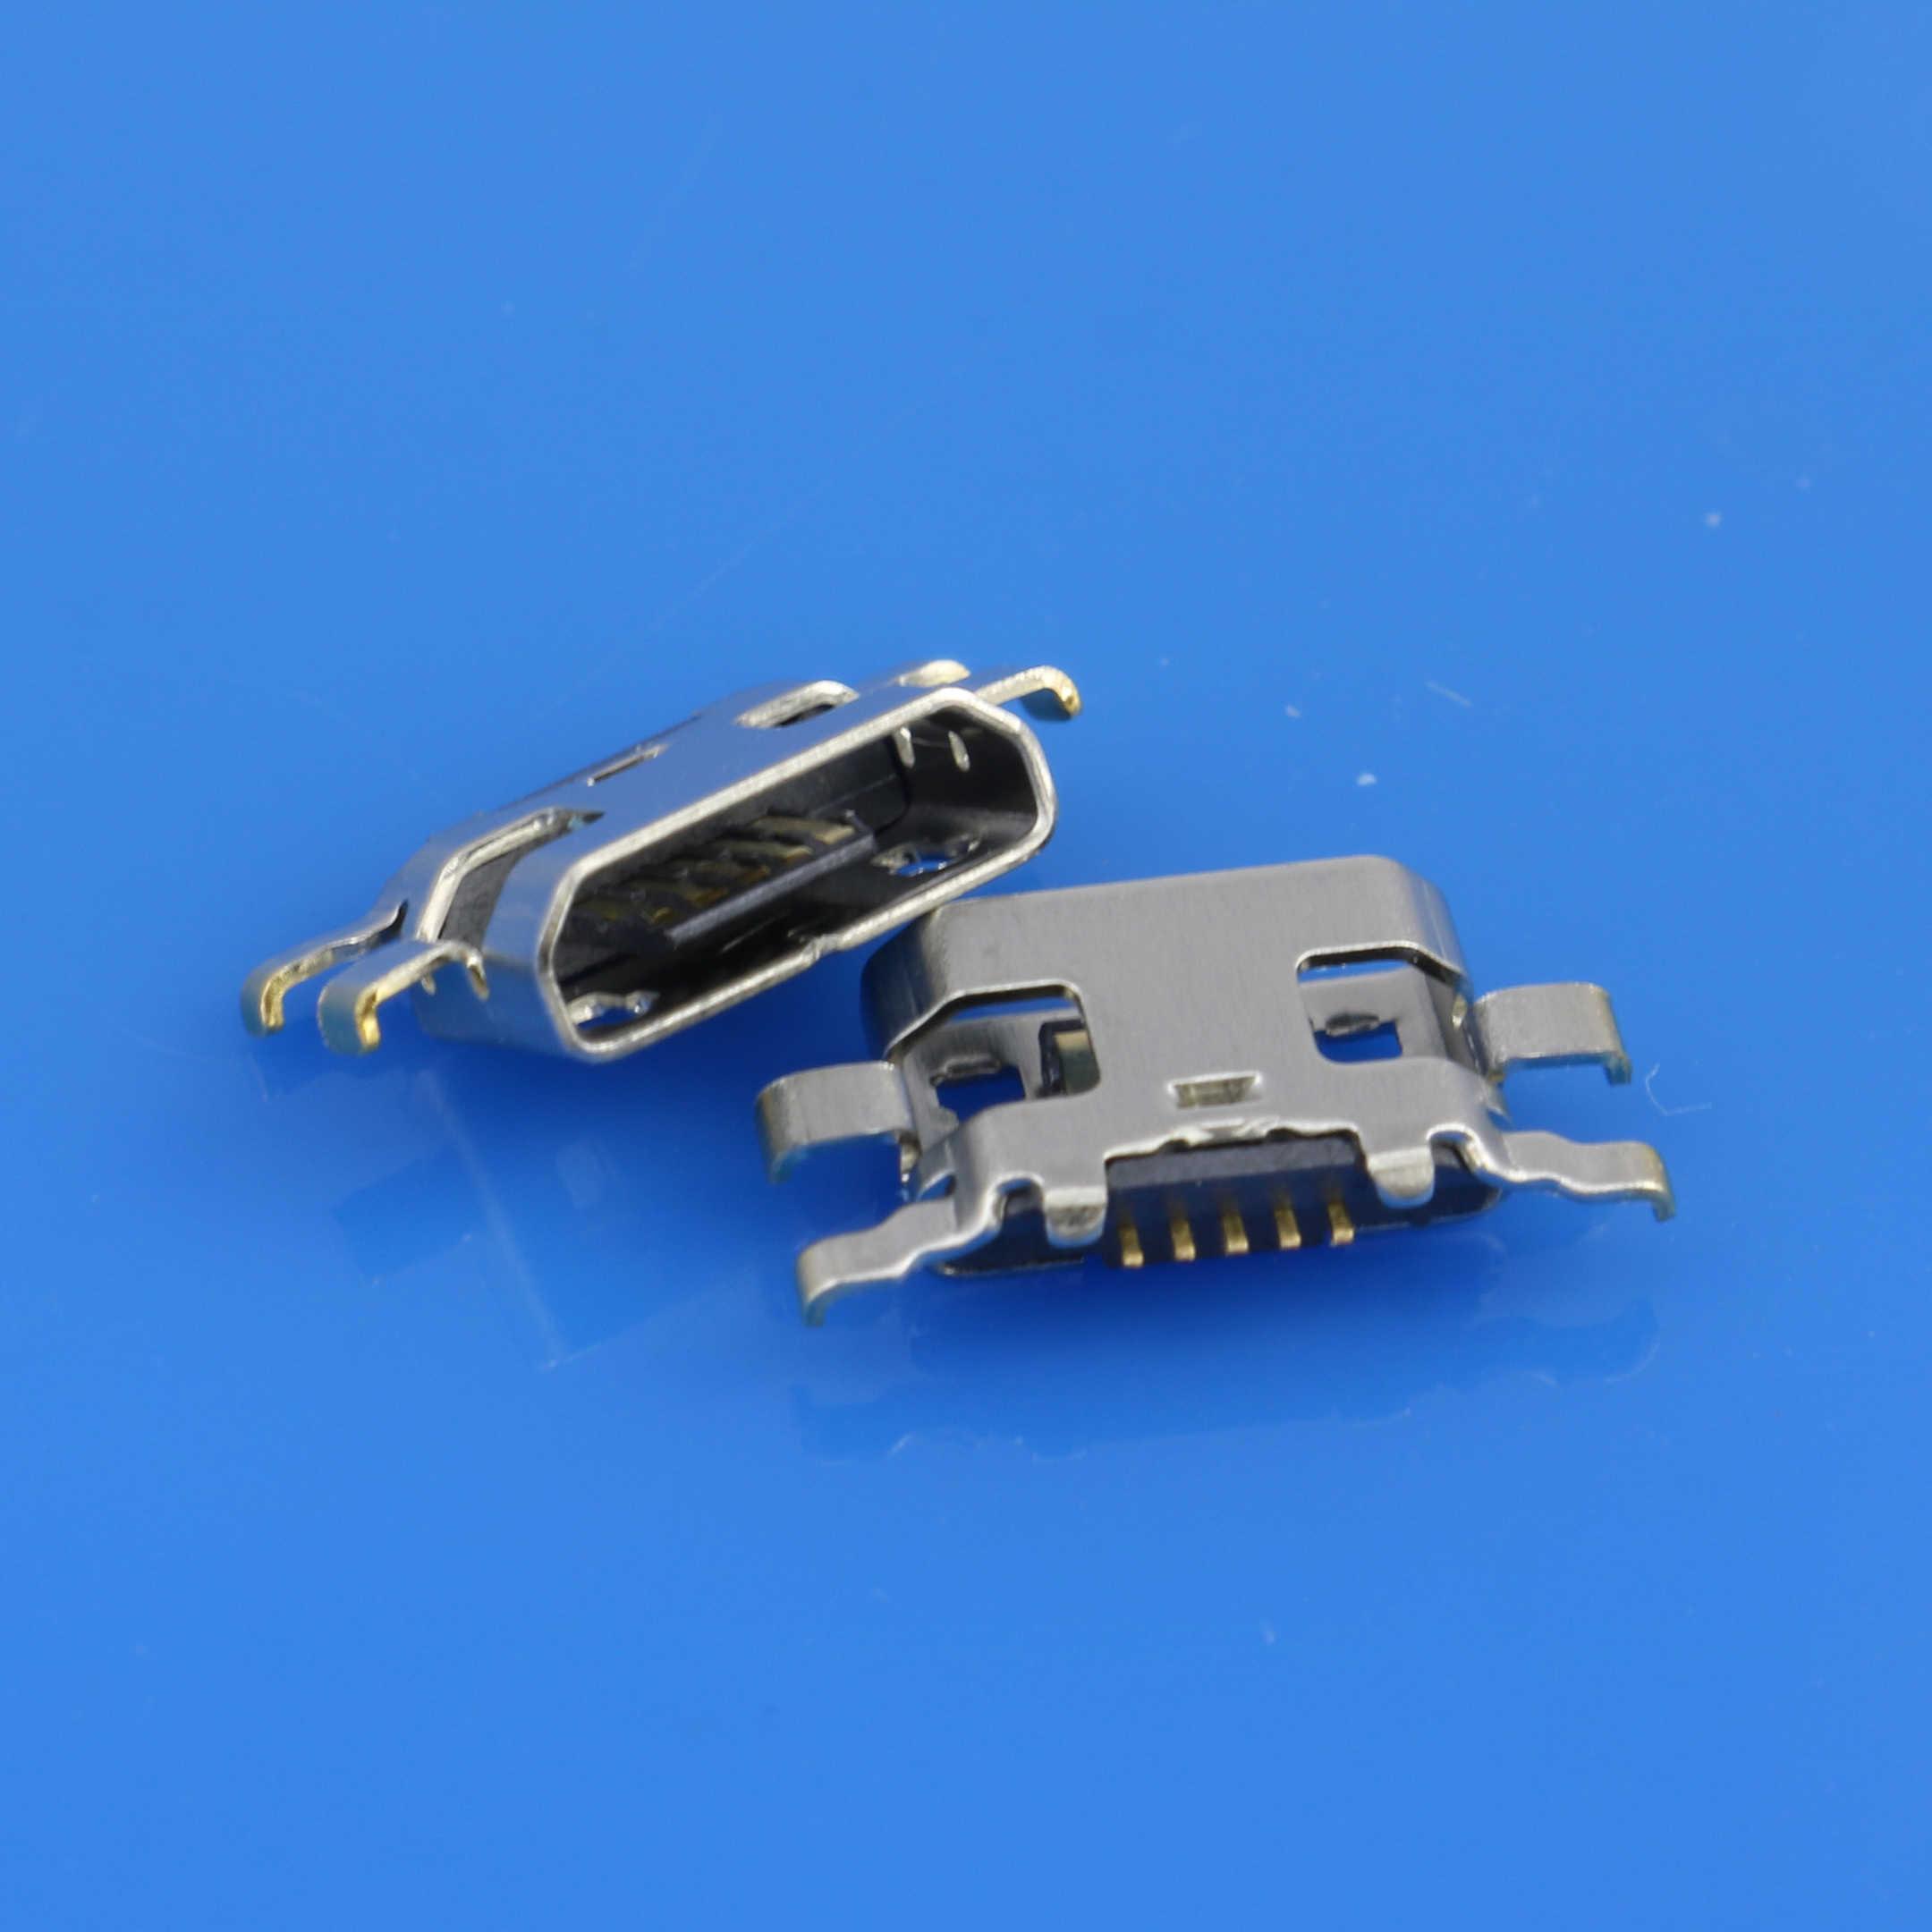 JCD 15 ชิ้น/ล็อต Micro mini USB DC แจ็คซ็อกเก็ตขั้วต่อชาร์จพอร์ต 5 Pin ปลั๊กทดแทนสำหรับ moto C PLUS